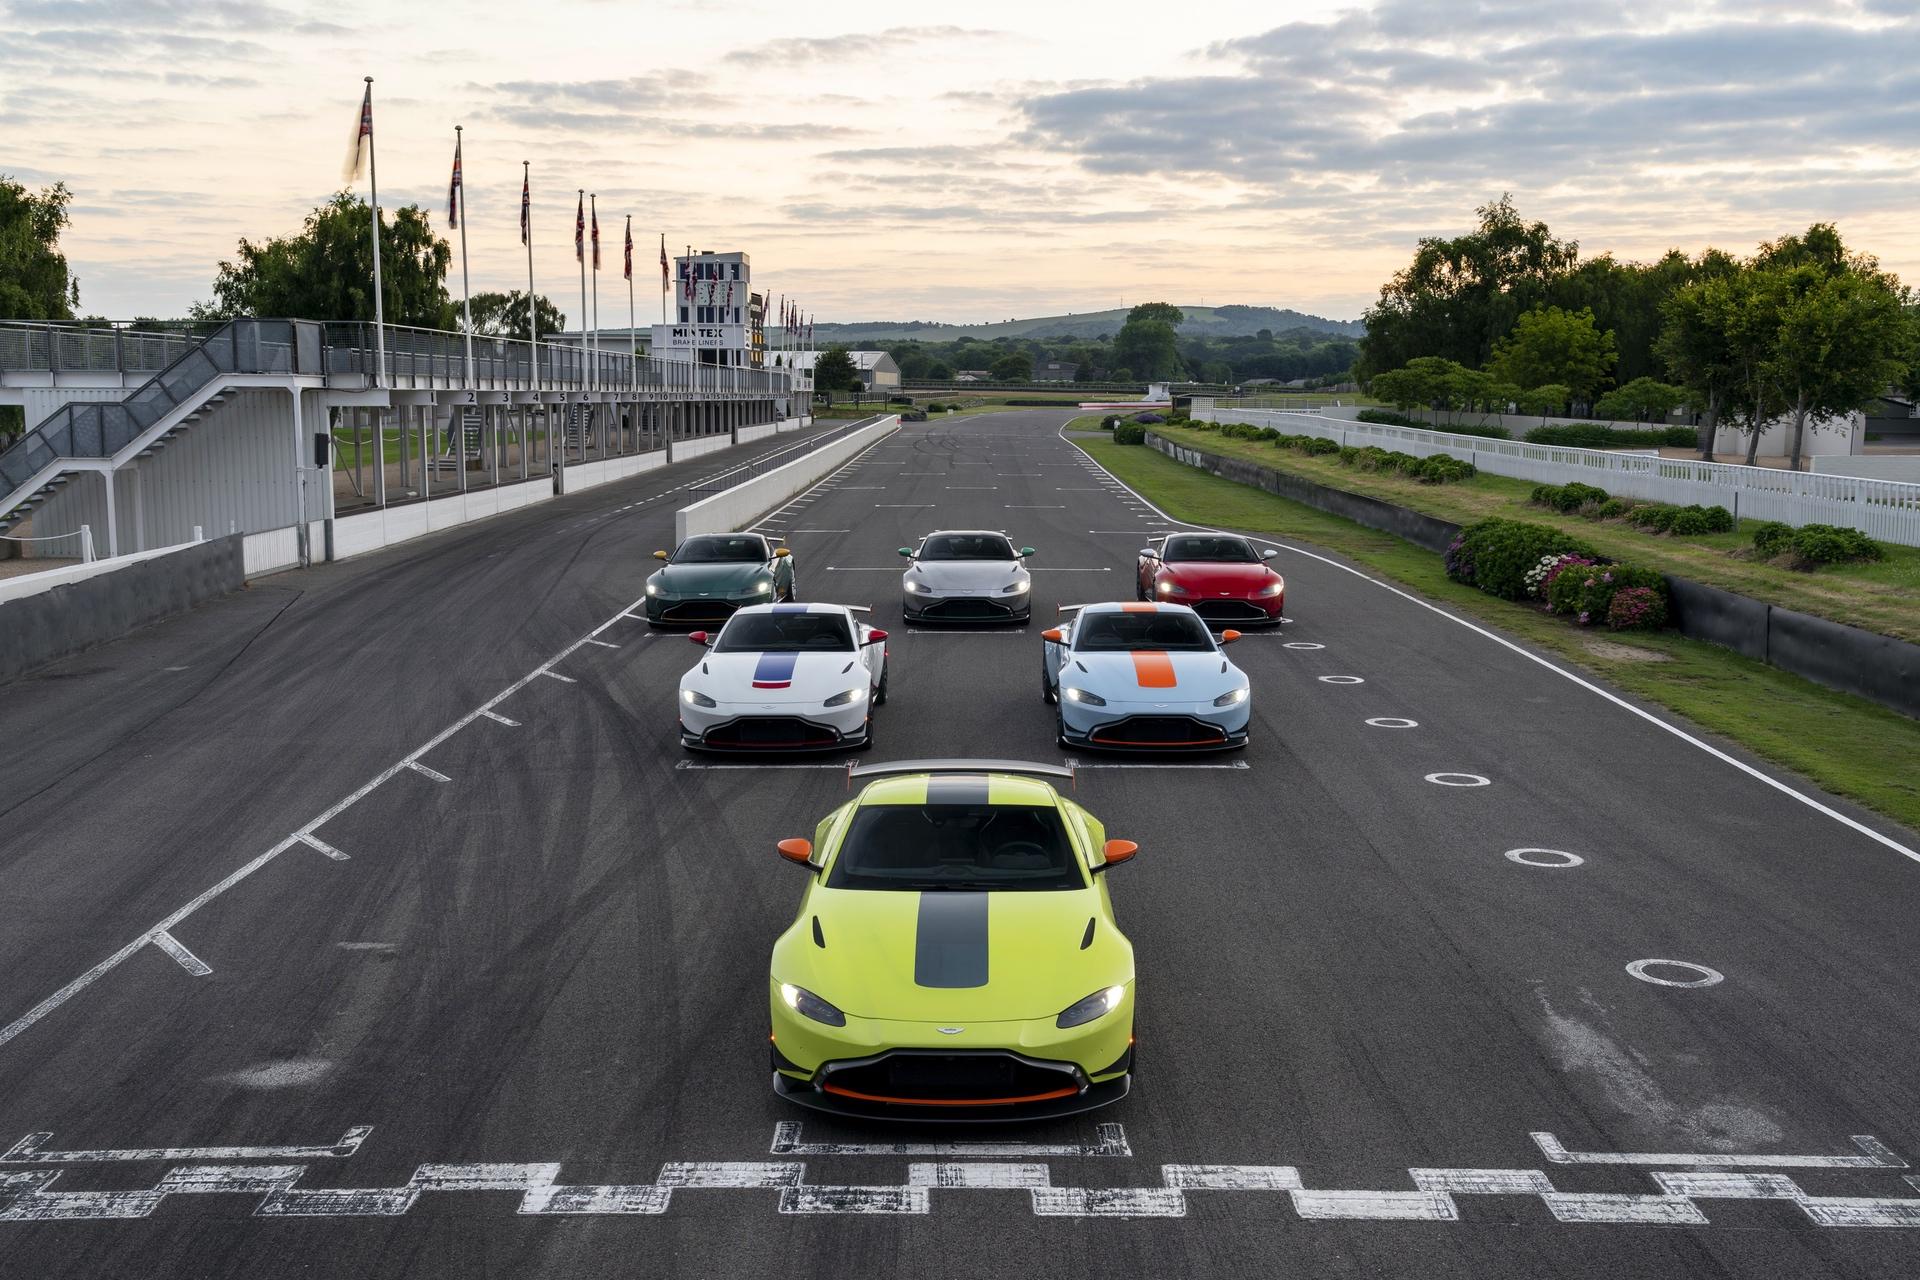 Aston-Martin_Goodwood-FoS-2019_09